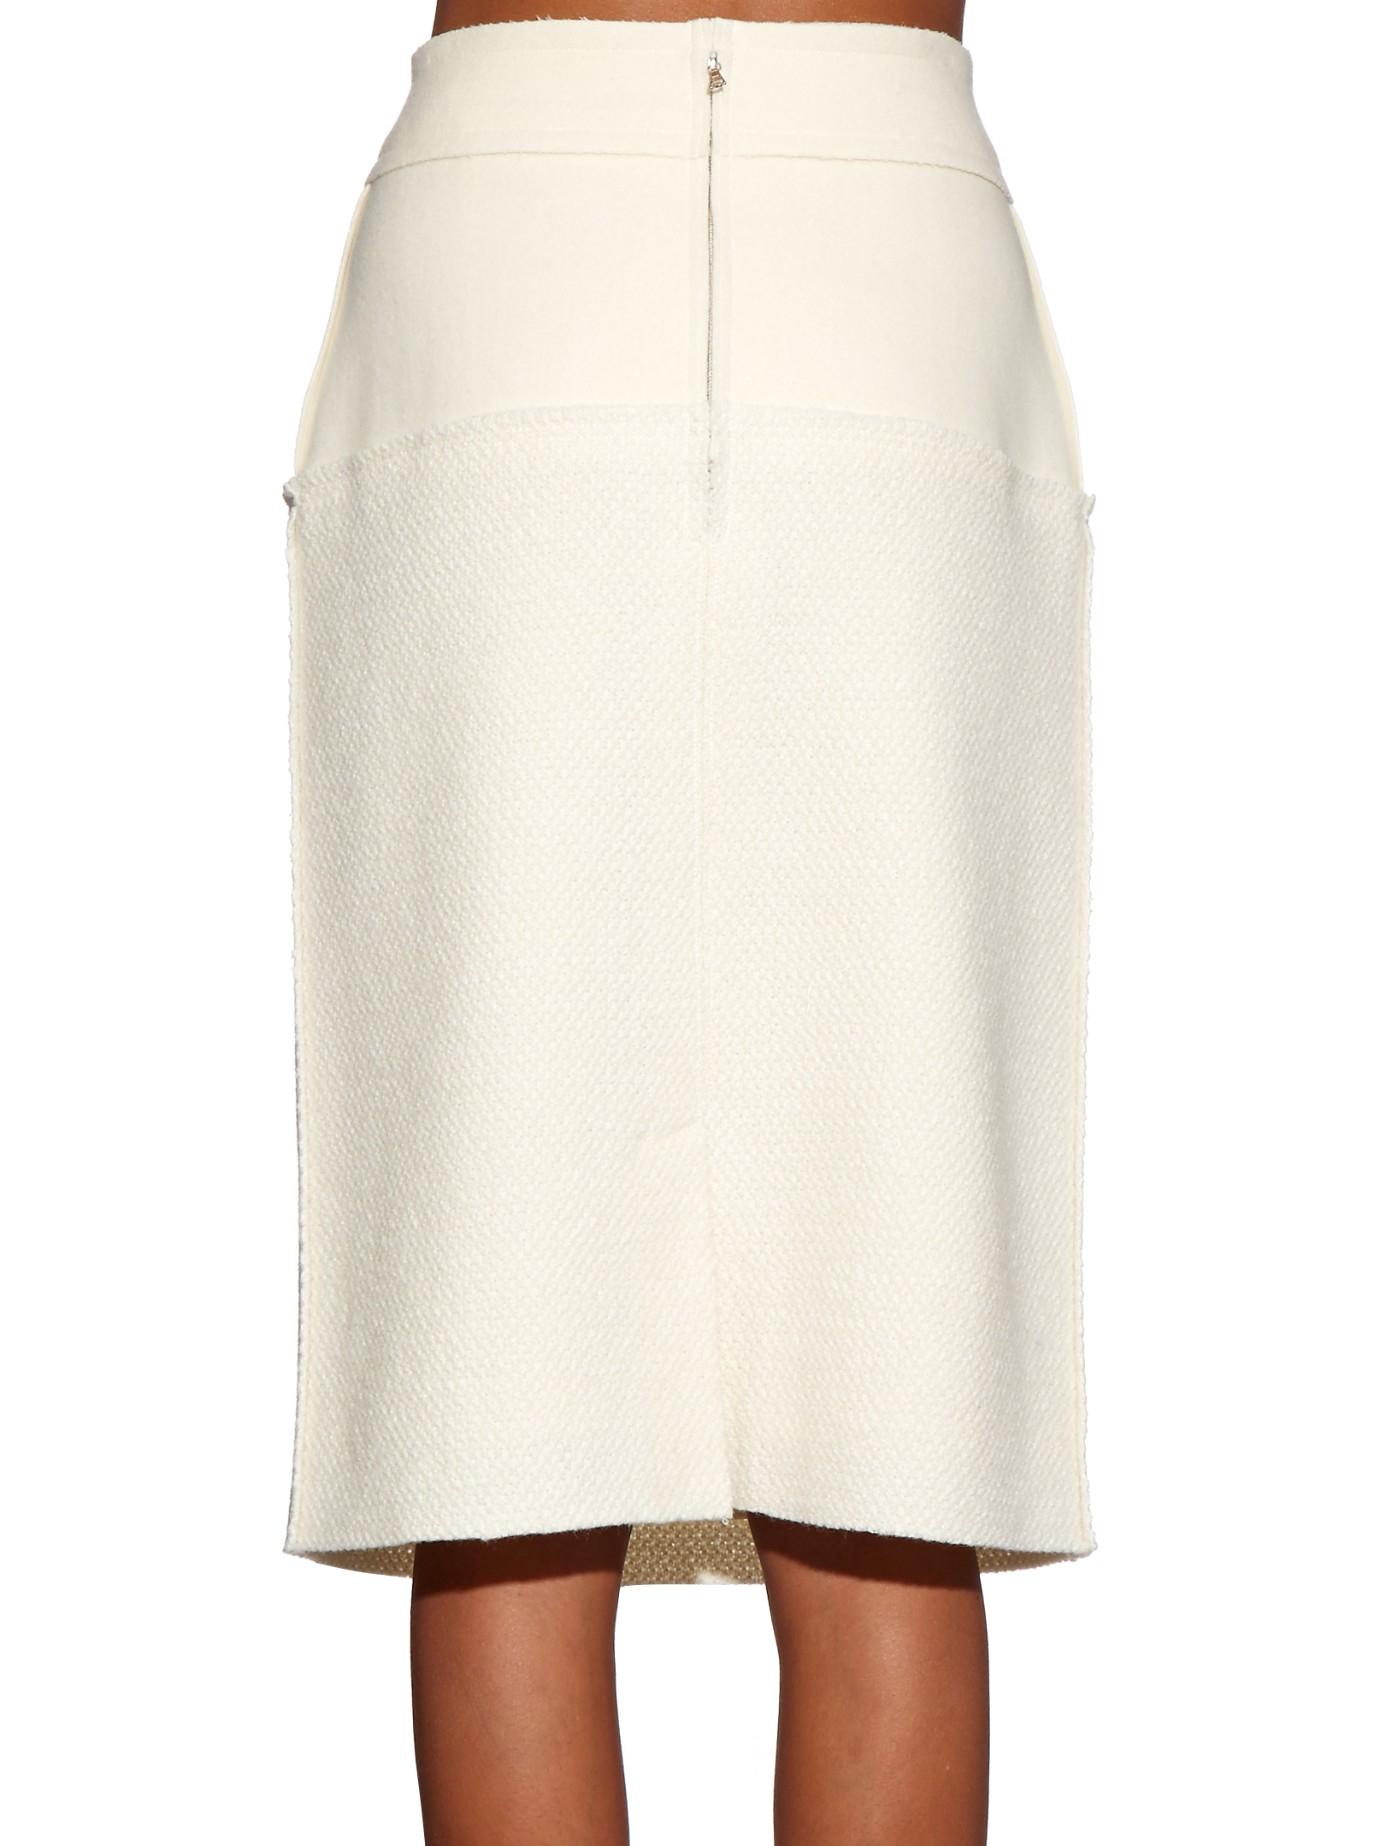 Oscar de la renta High-rise Wool Pencil Skirt in Natural | Lyst